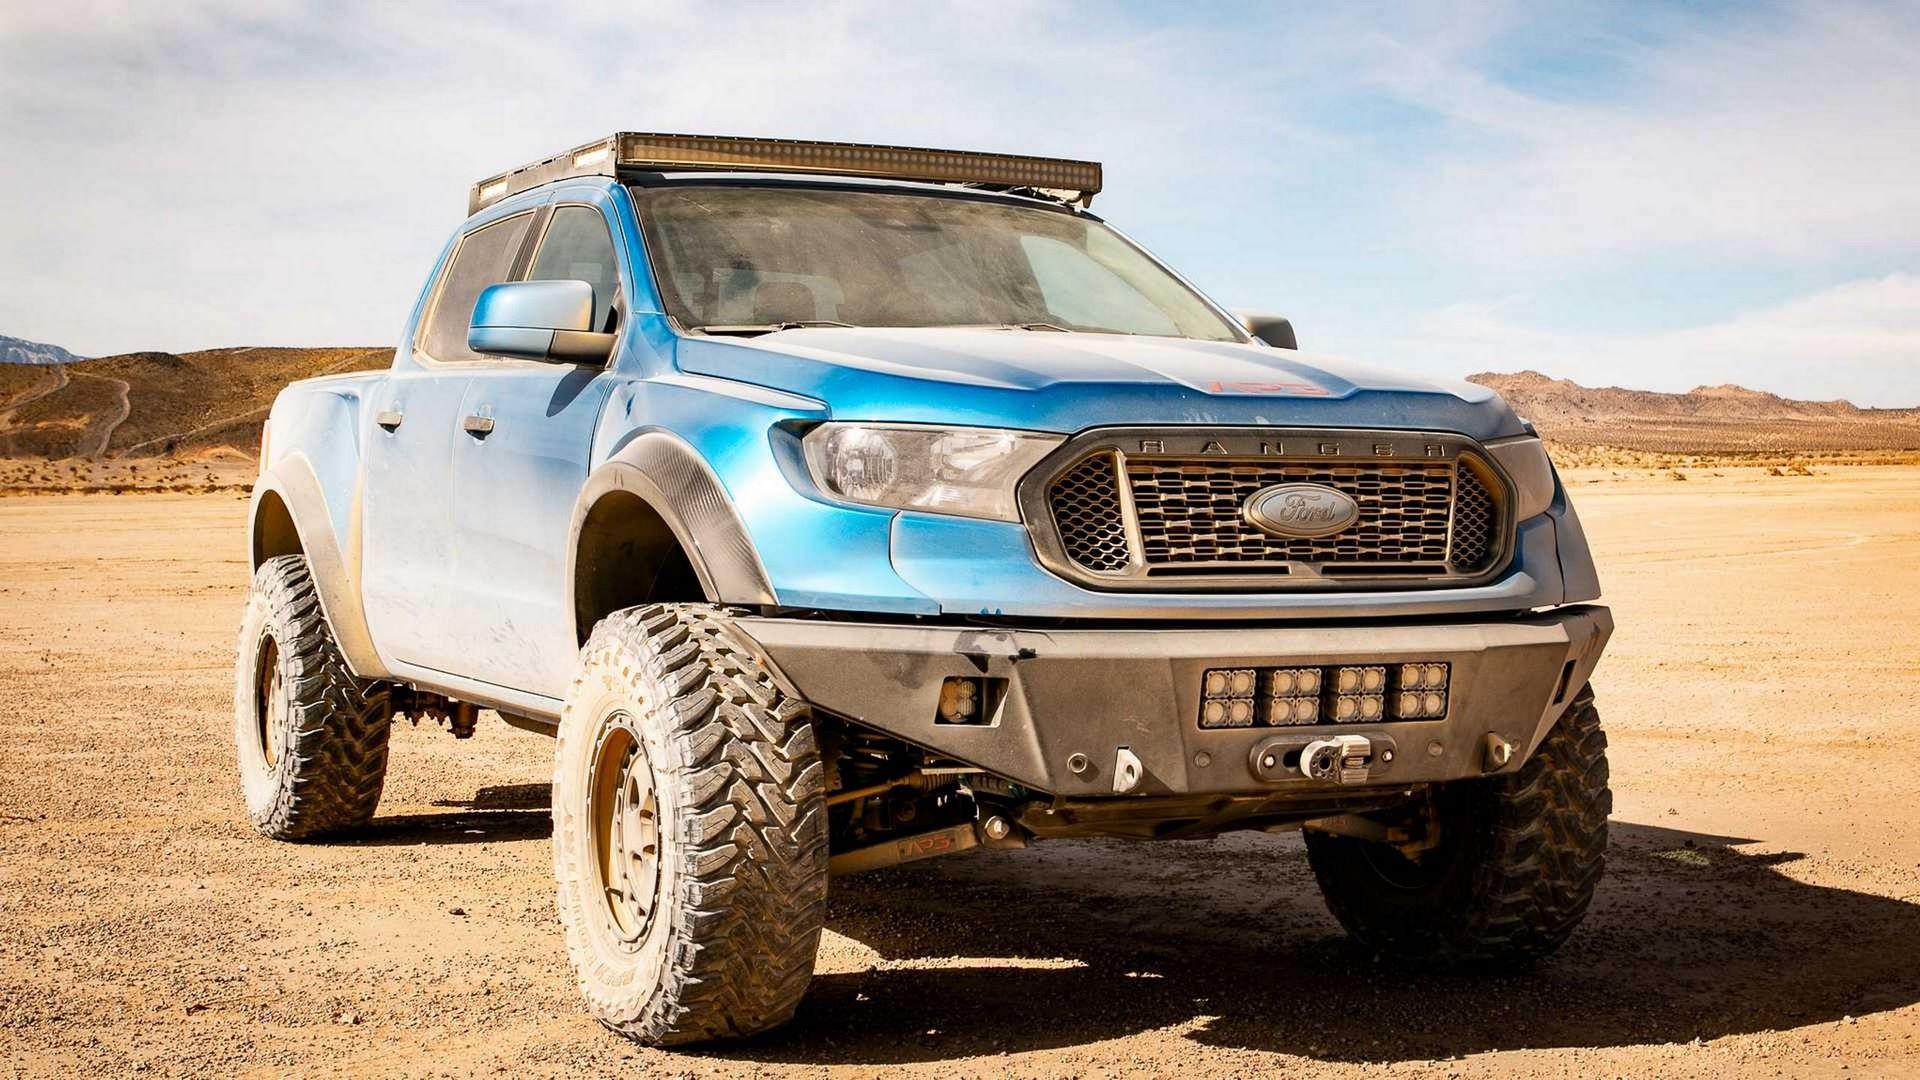 Ford-Ranger-Prorunner-By-APG-5